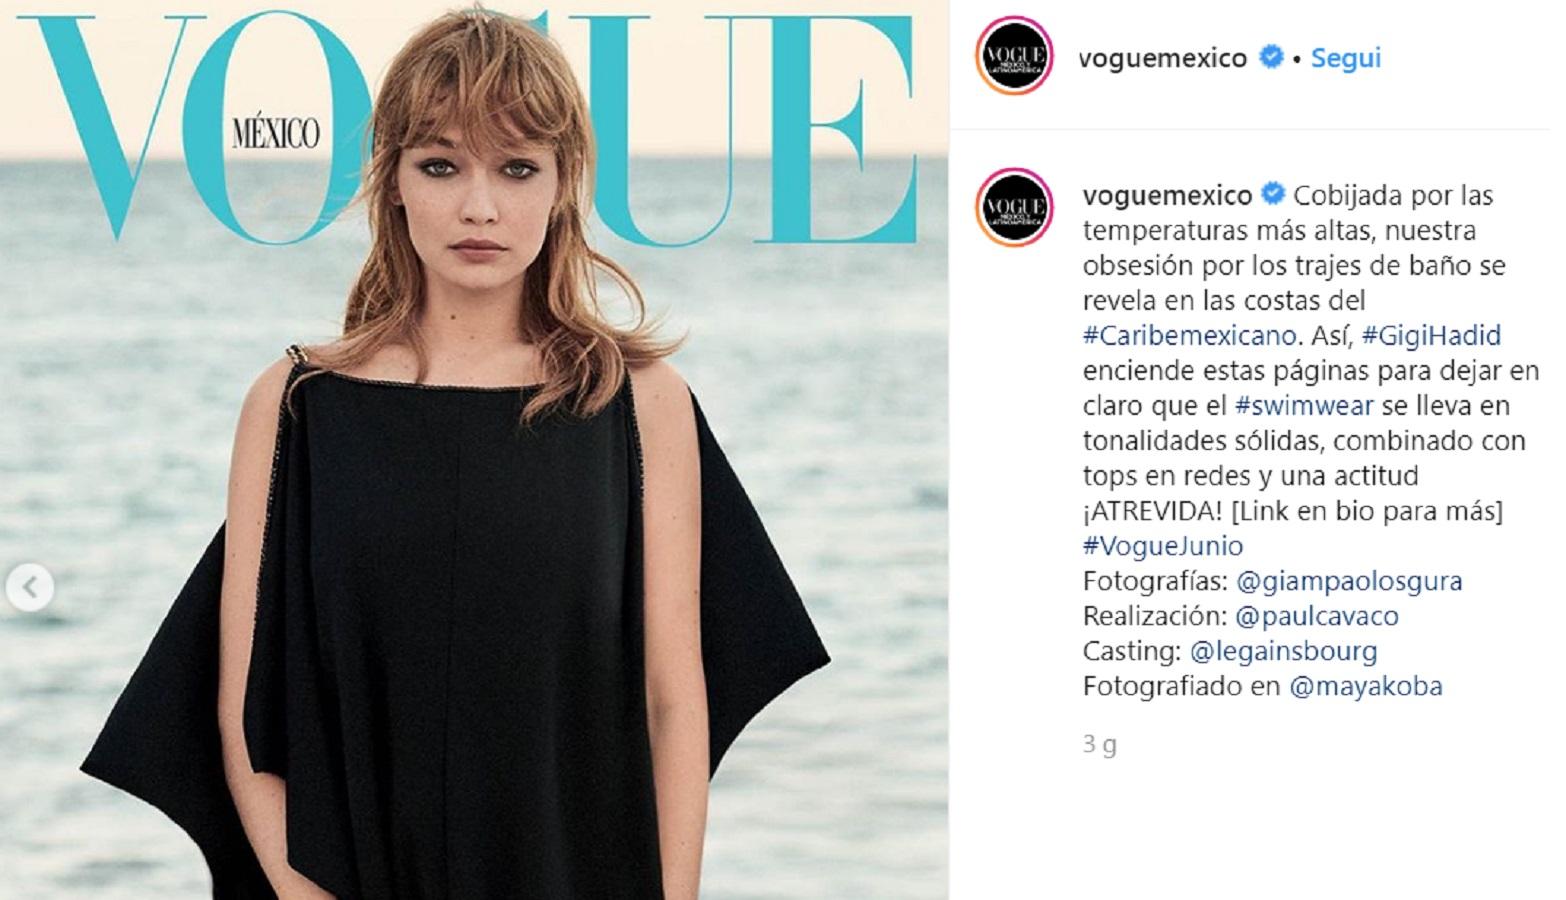 Gigi Hadid, le foto del nuovo look con frangia finta!